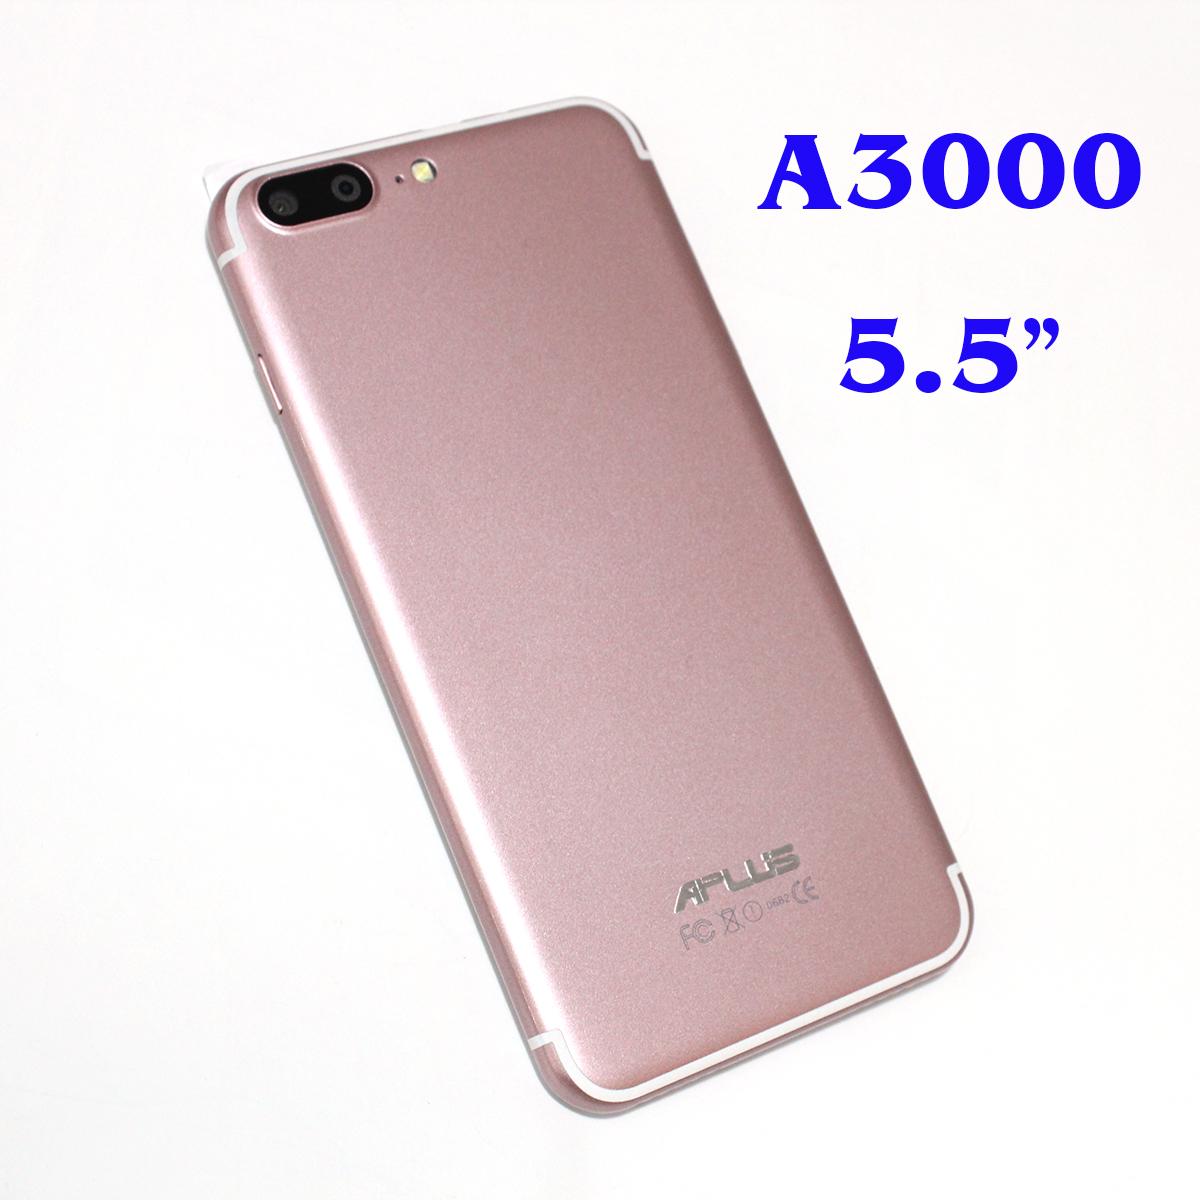 APLUS A3000 (i7) 4 core จอใหญ่ 5.5 นิ้ว กล้อง 13 ล้าน 2 ซิม